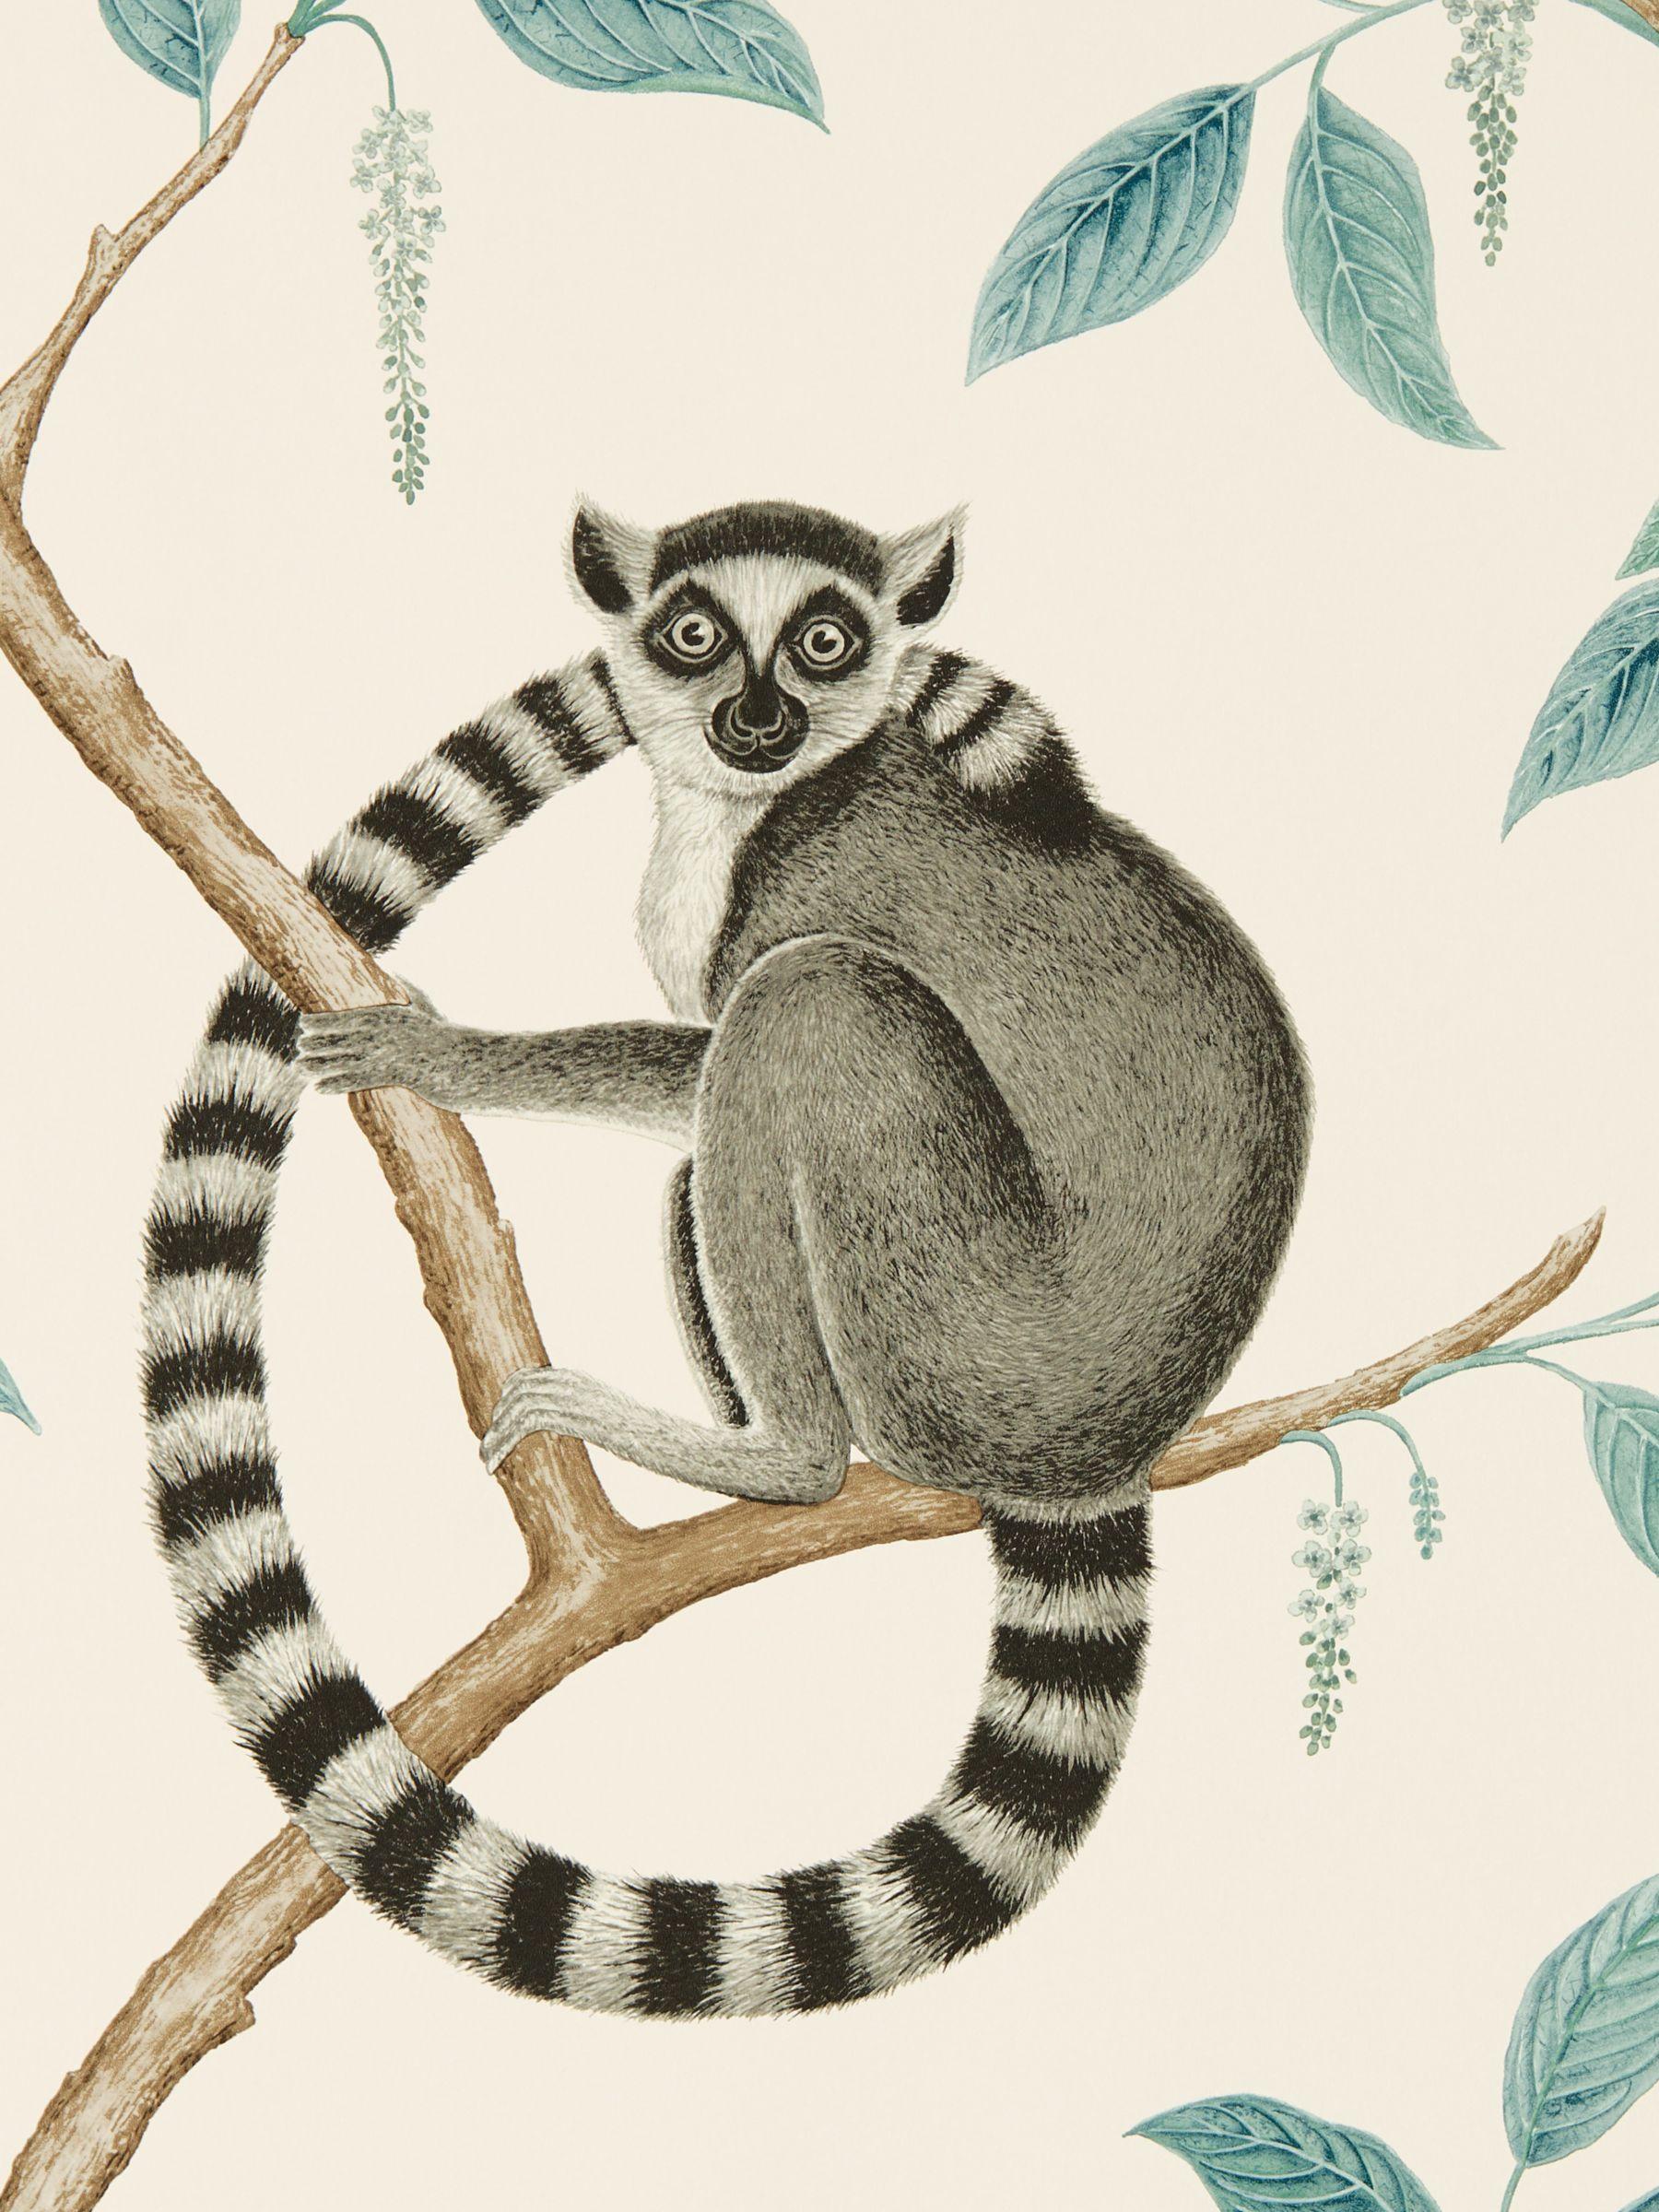 Sanderson Sanderson Ringtailed Lemur Wallpaper